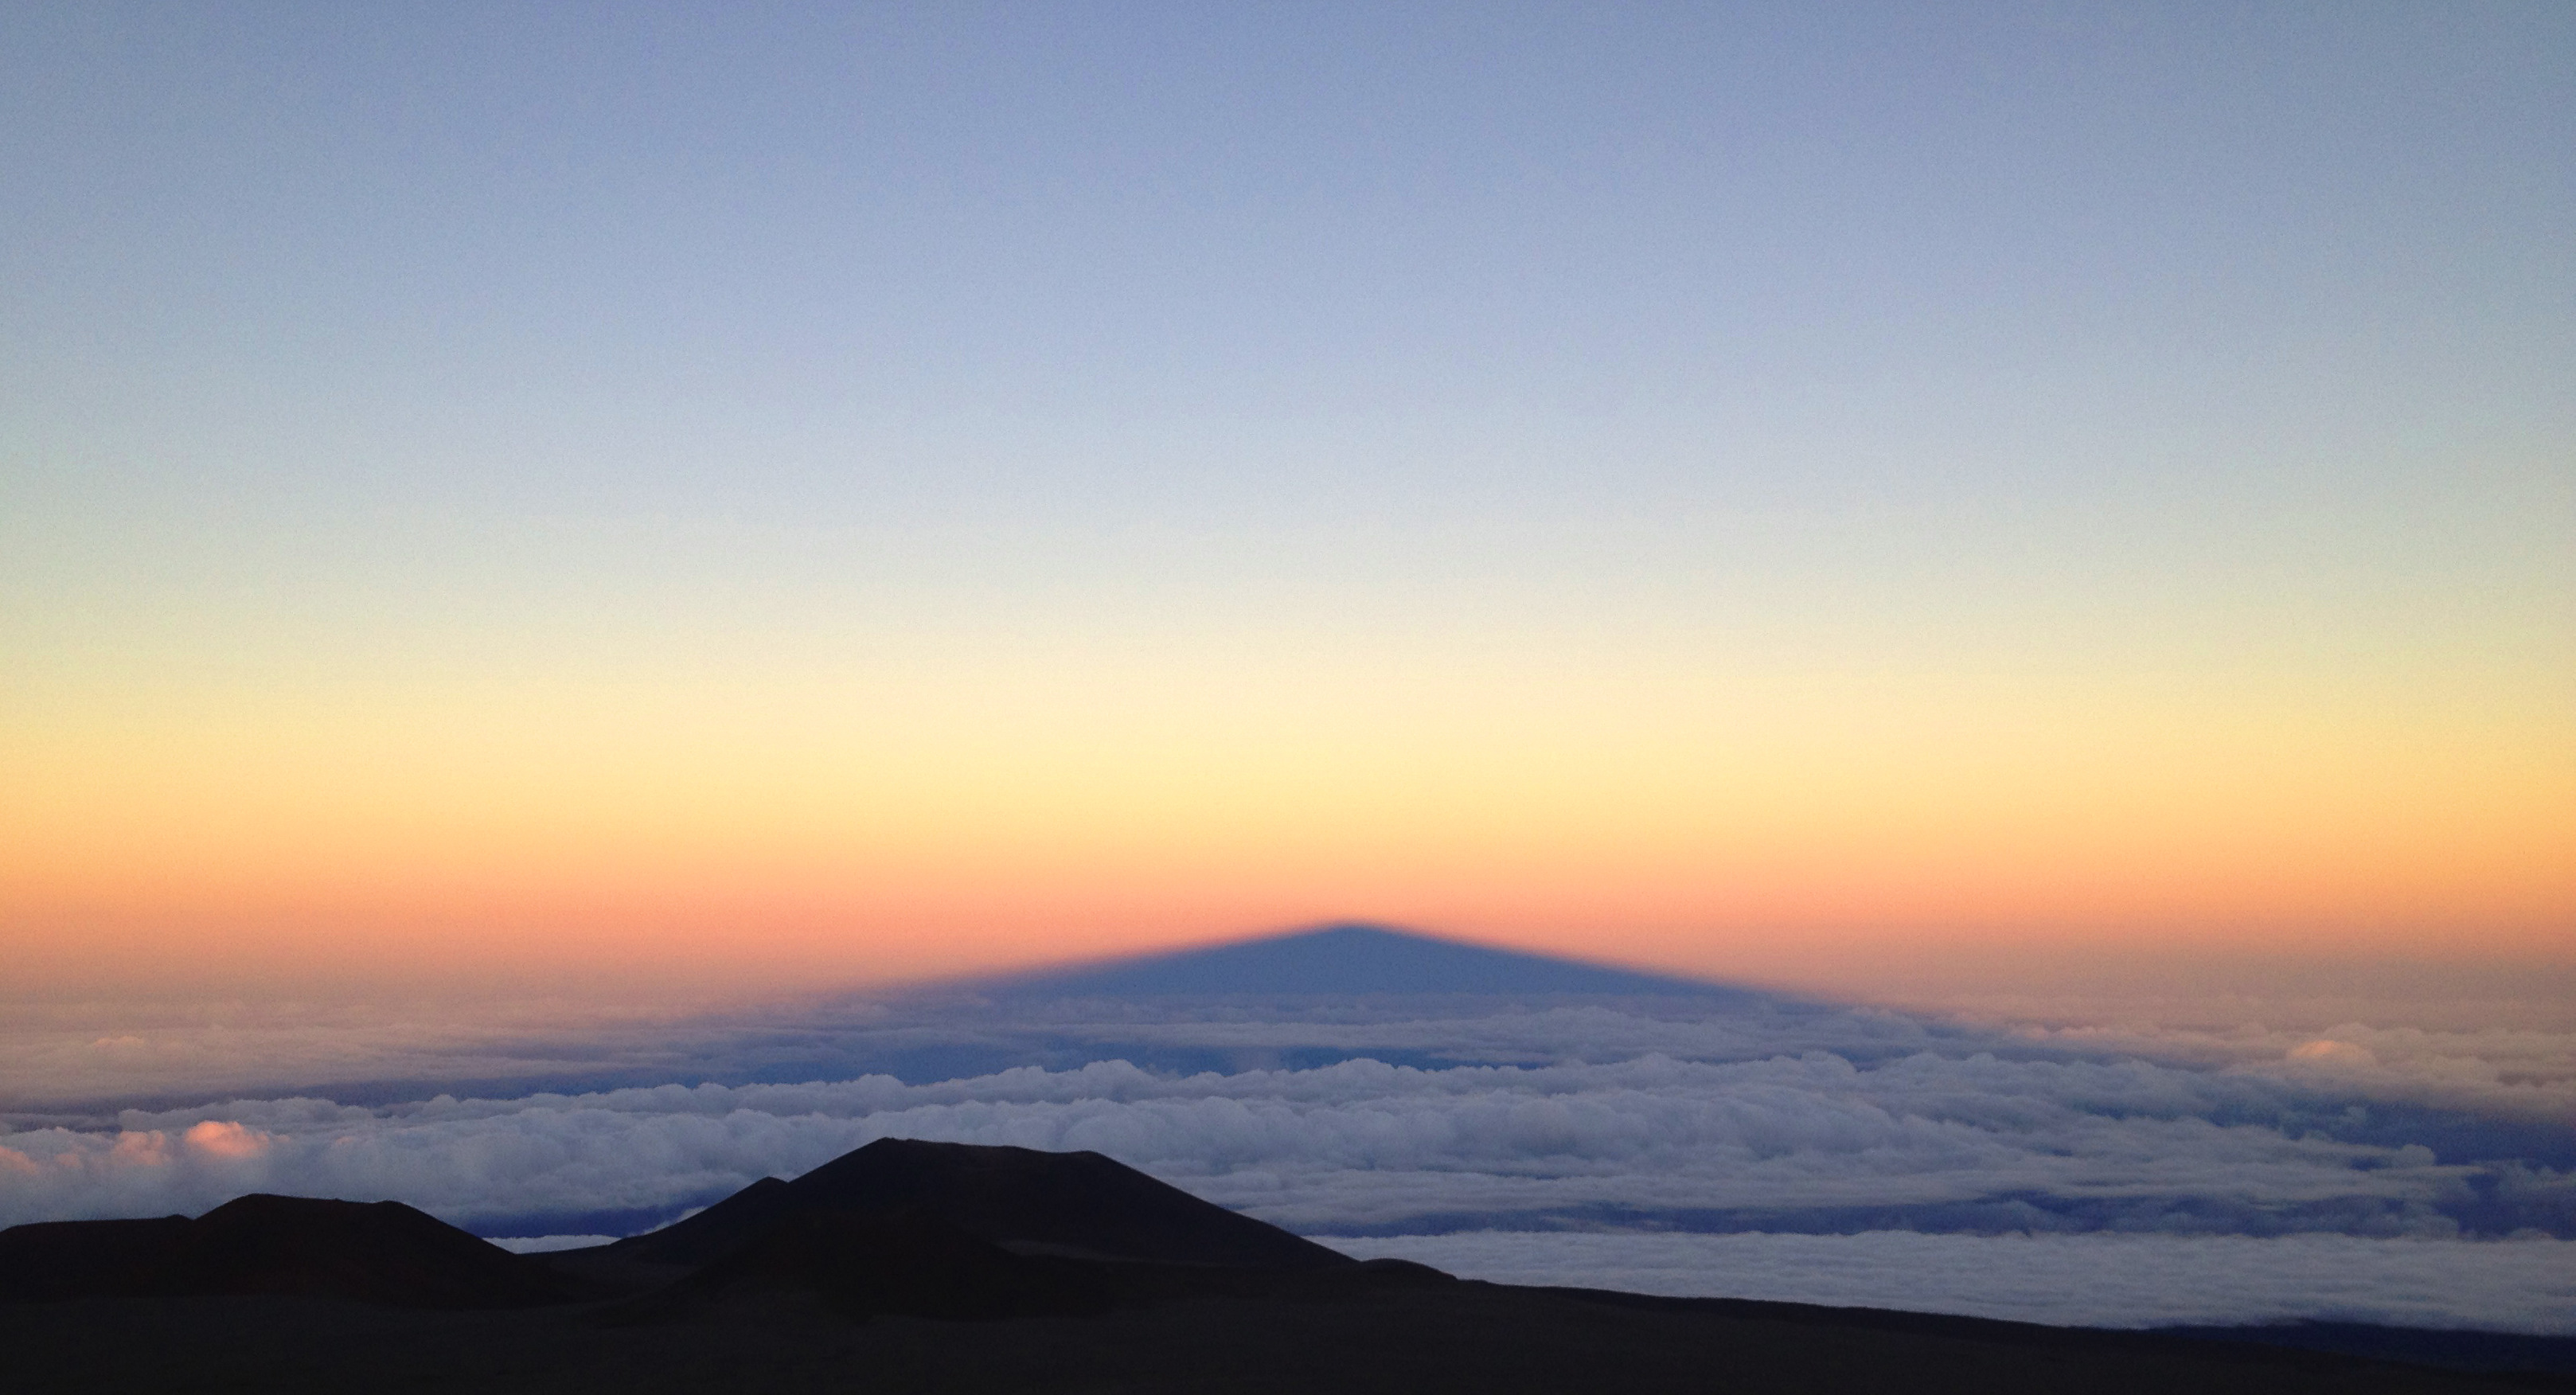 The shadow of Mauna Kea peak on the clouds down below